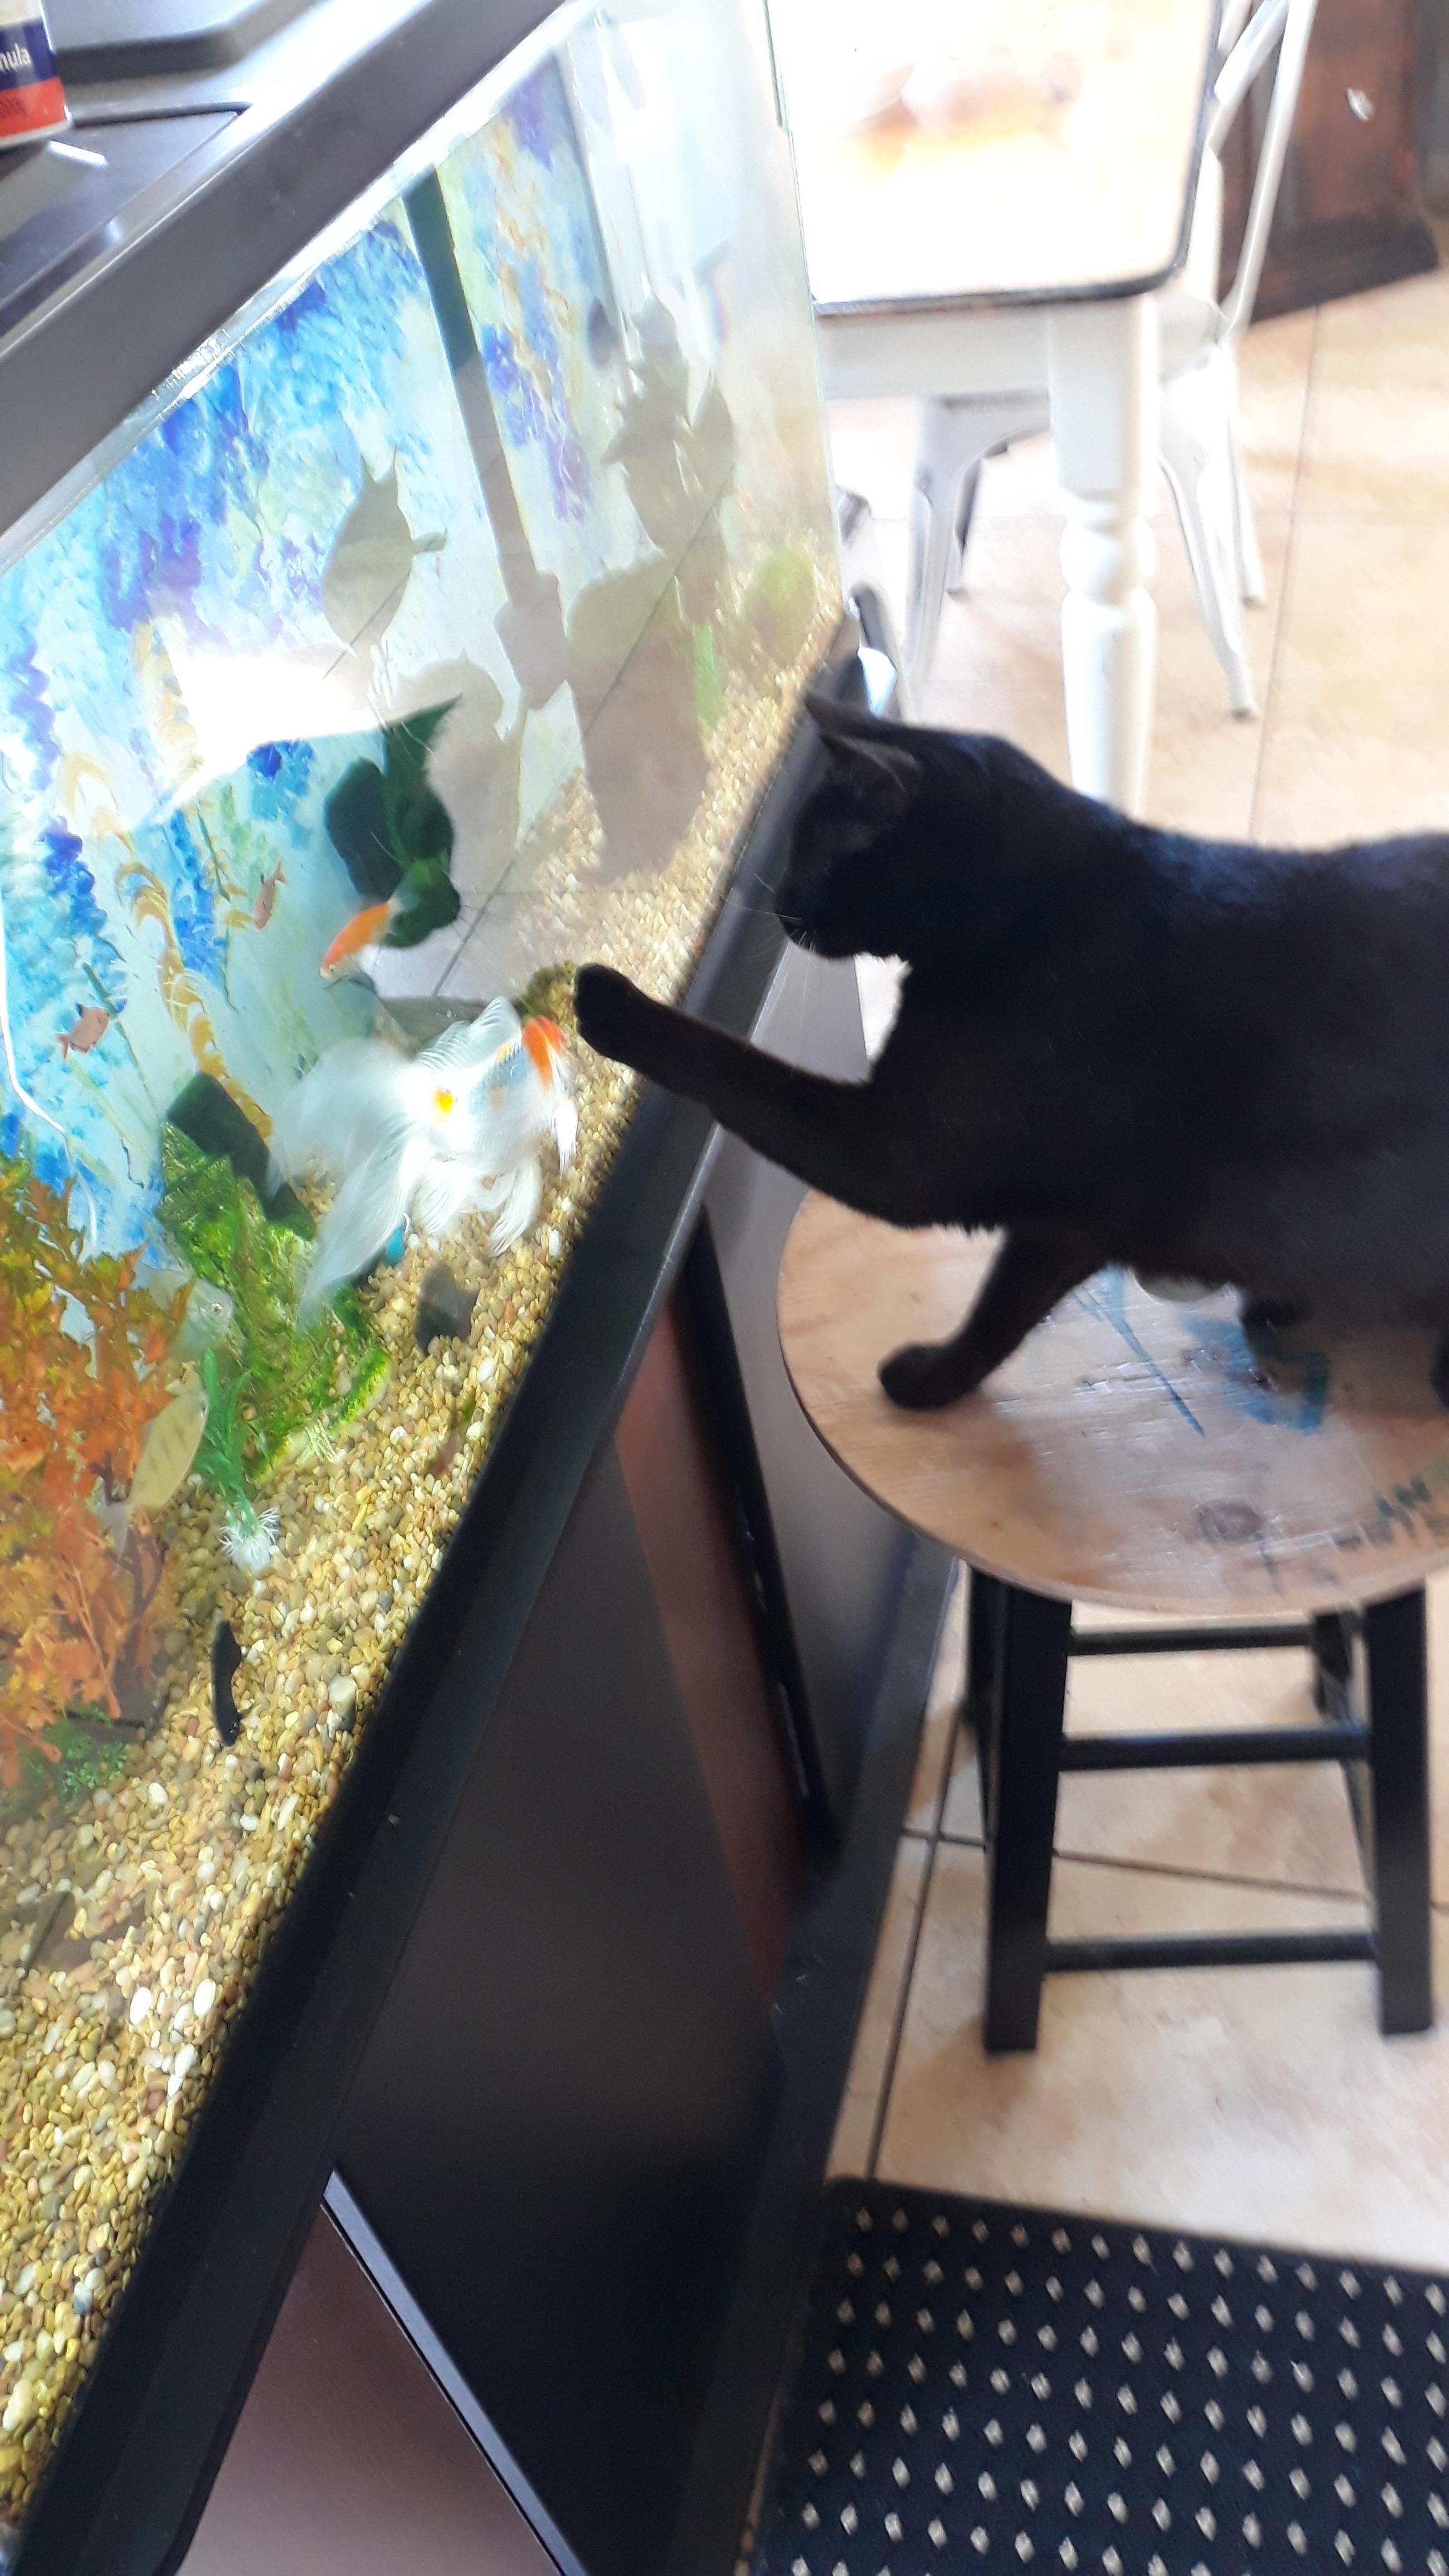 Zangief Looking At My Mother S Aquarium Aquarium Cats Kitty